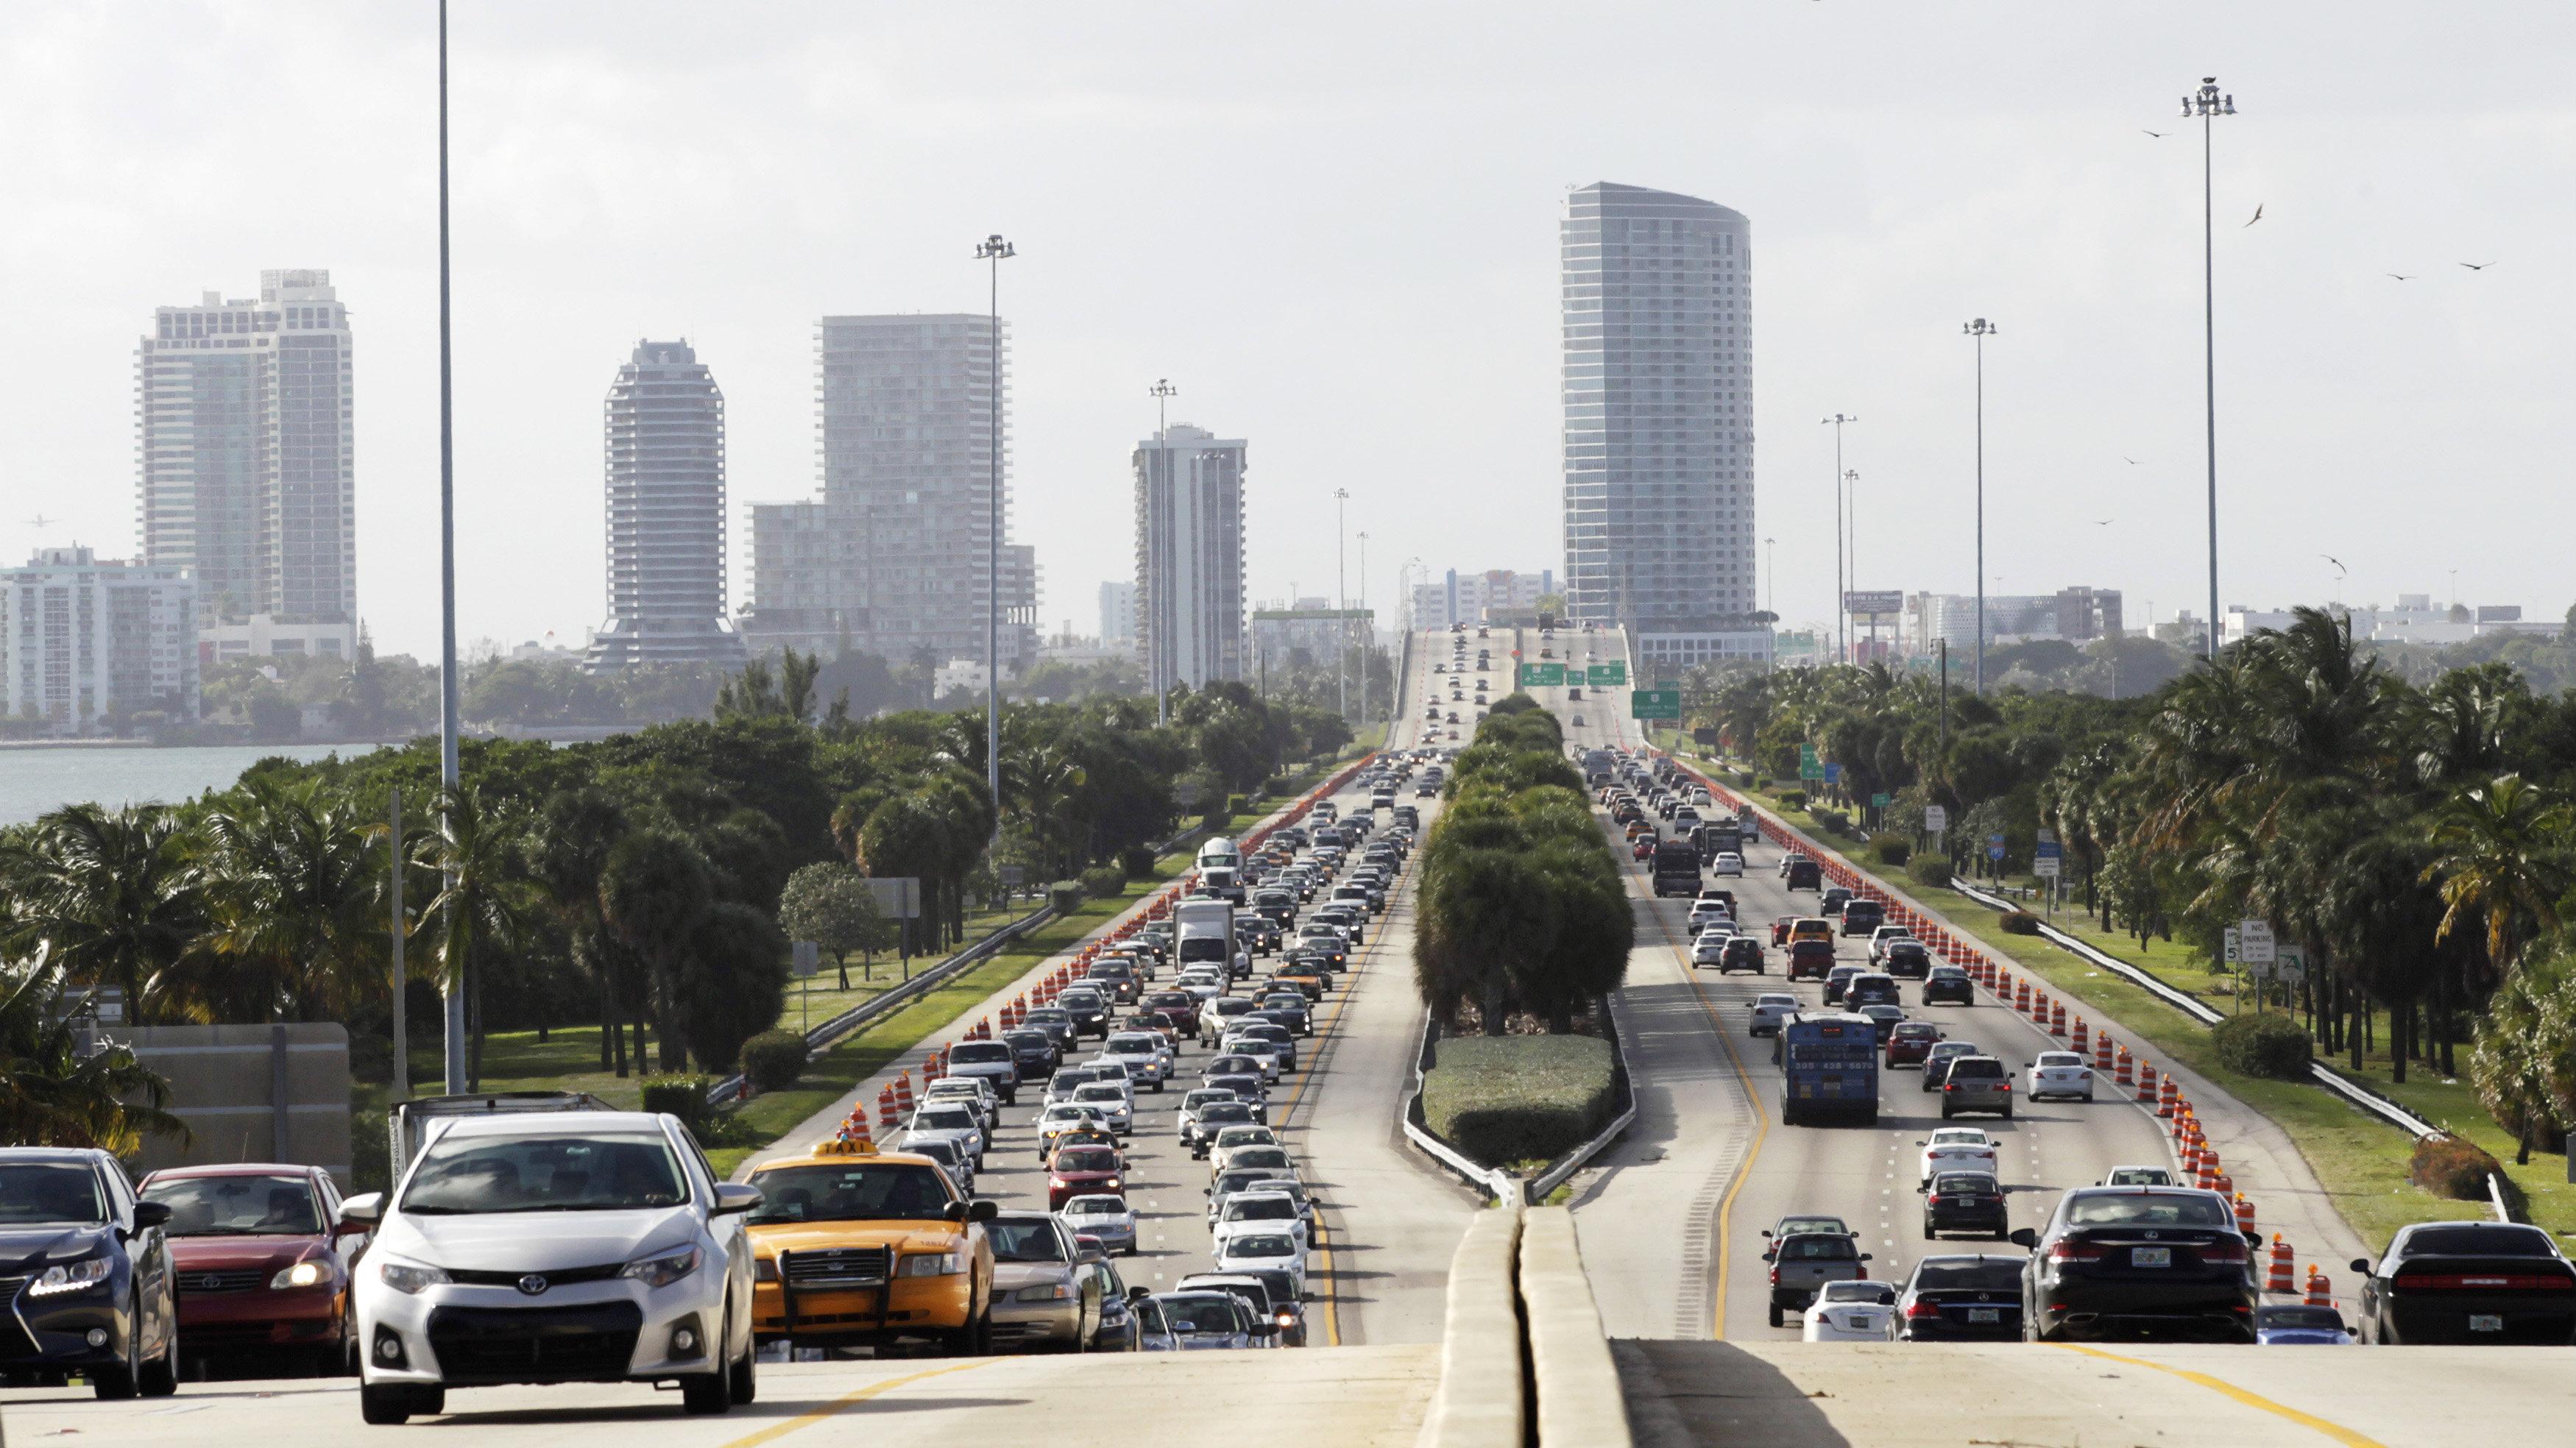 traffic near miami